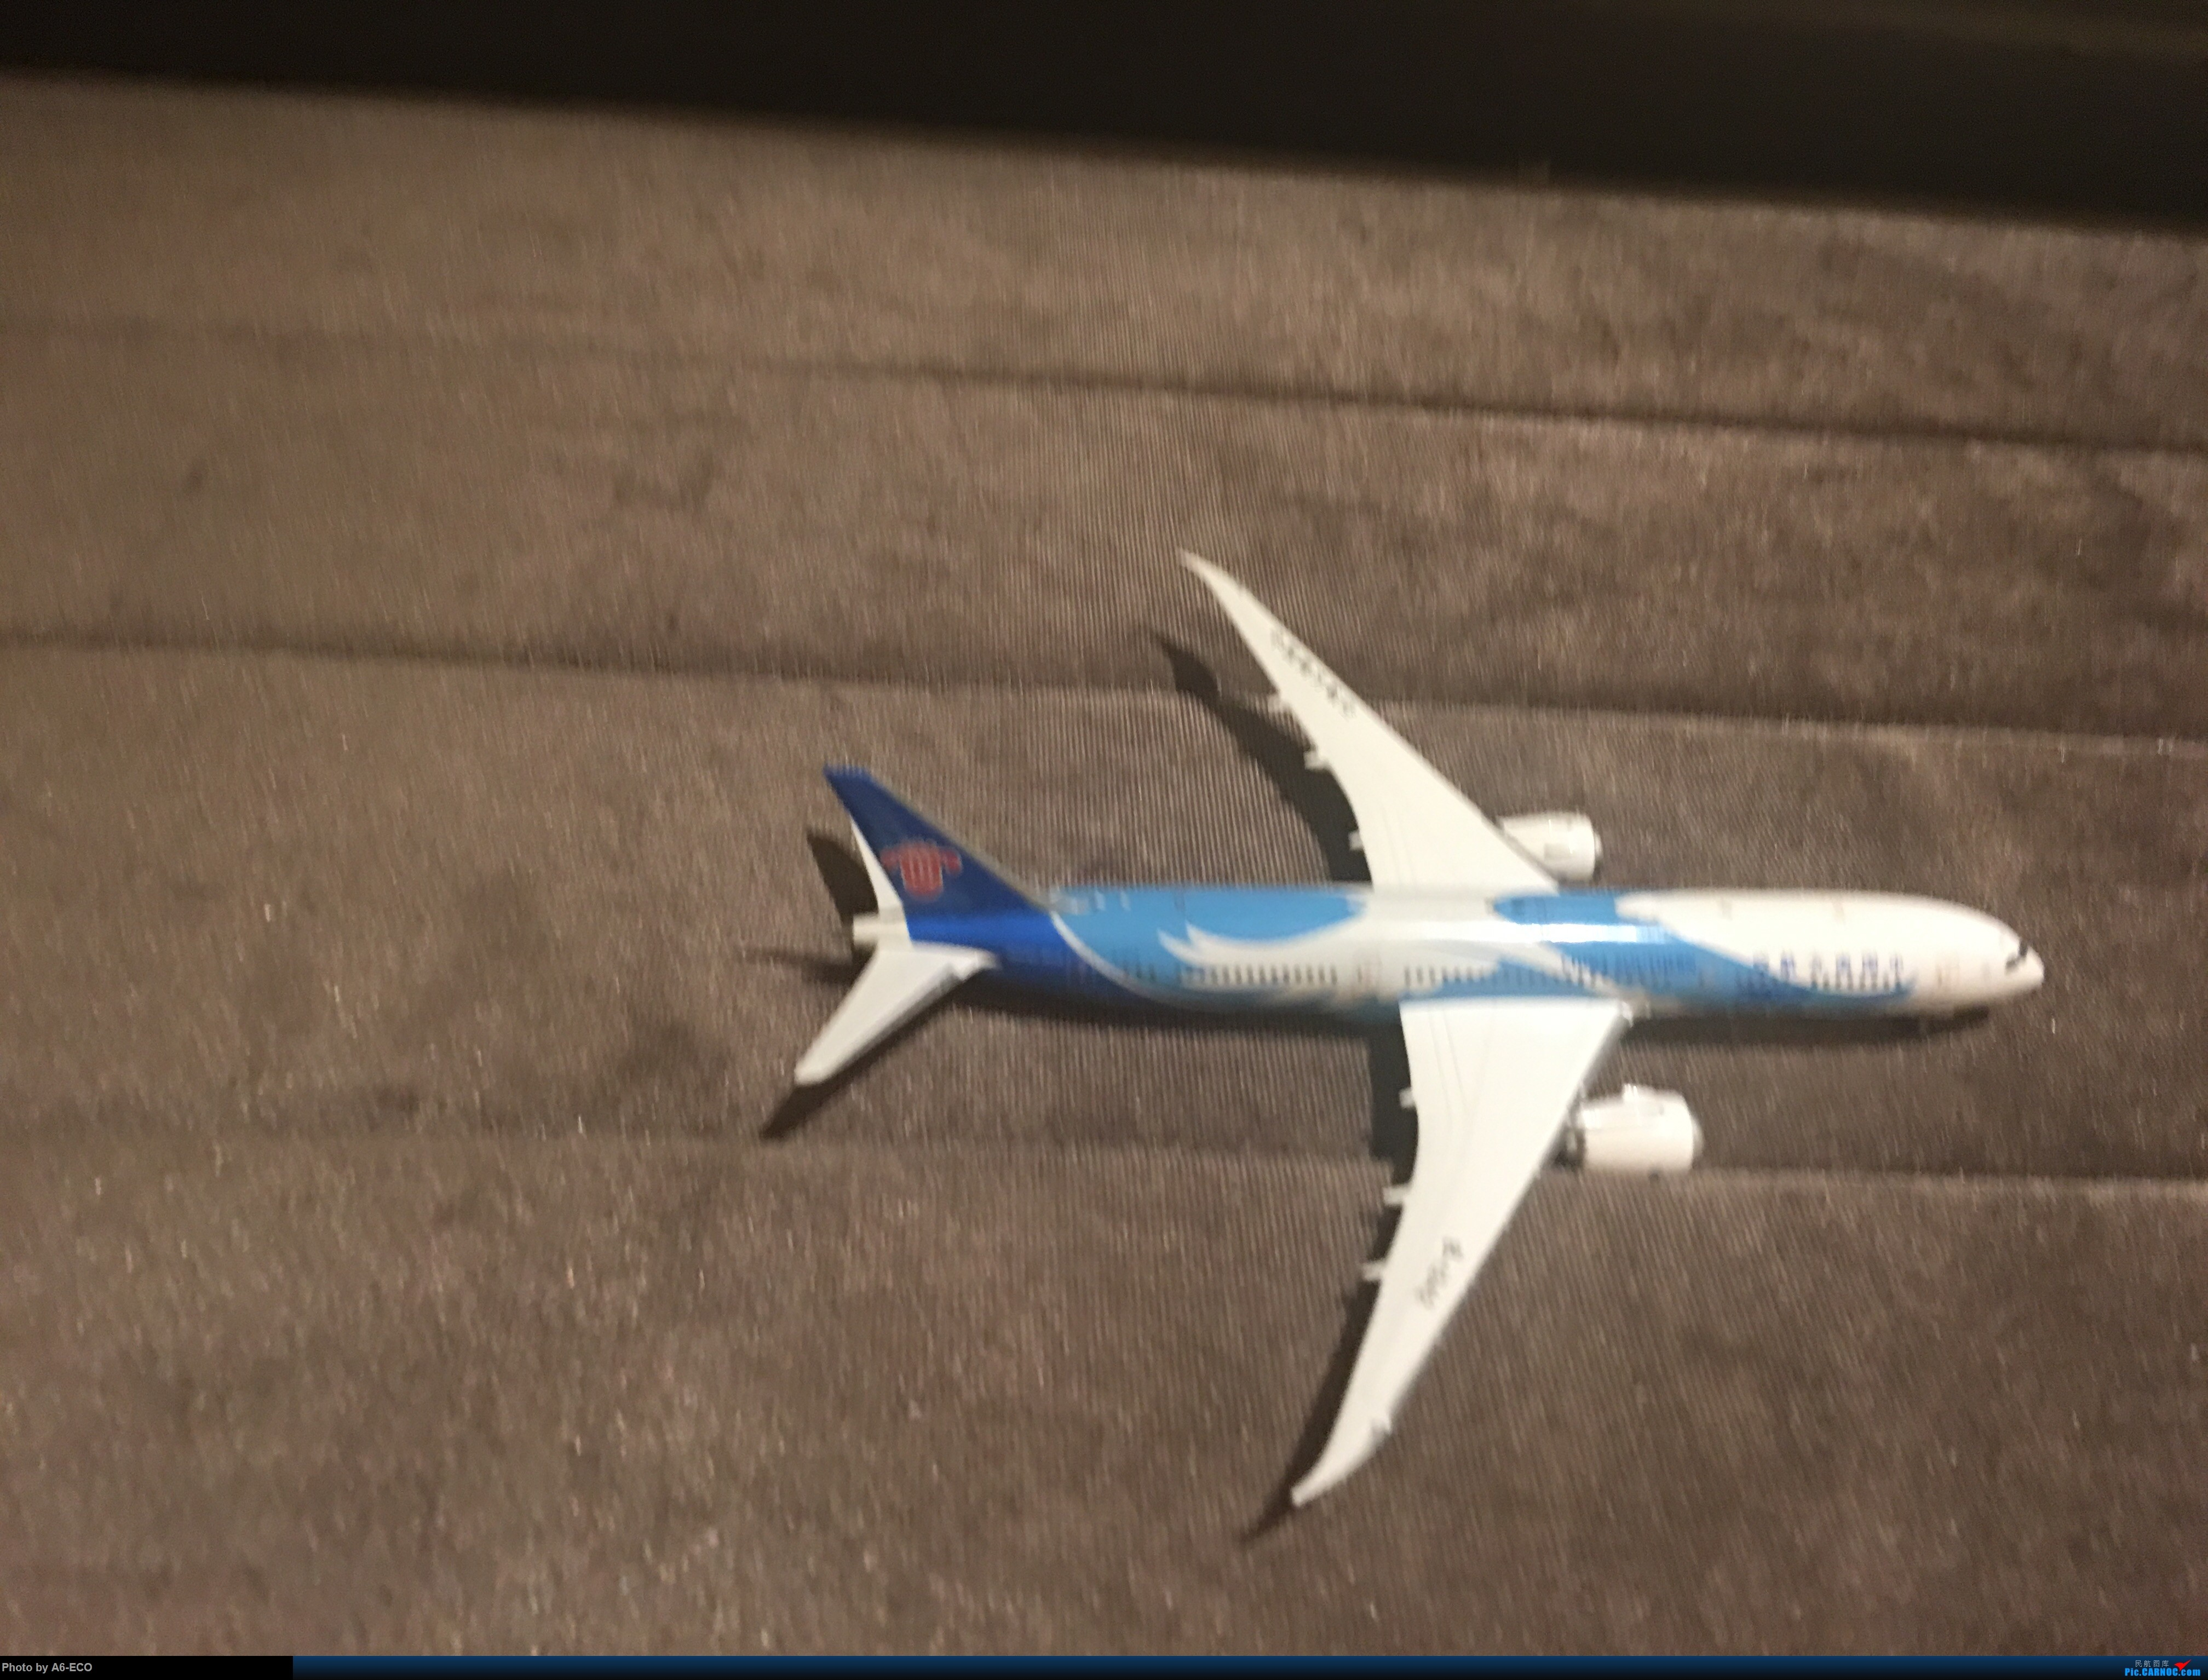 Re:Re:[原创]《Simon游记》第六季第八集 CZ3101&CZ3000 南航全新波音78W经济舱体验&详细测评 PEK八卦台烂天拍机 及回程A388上层公务舱记录